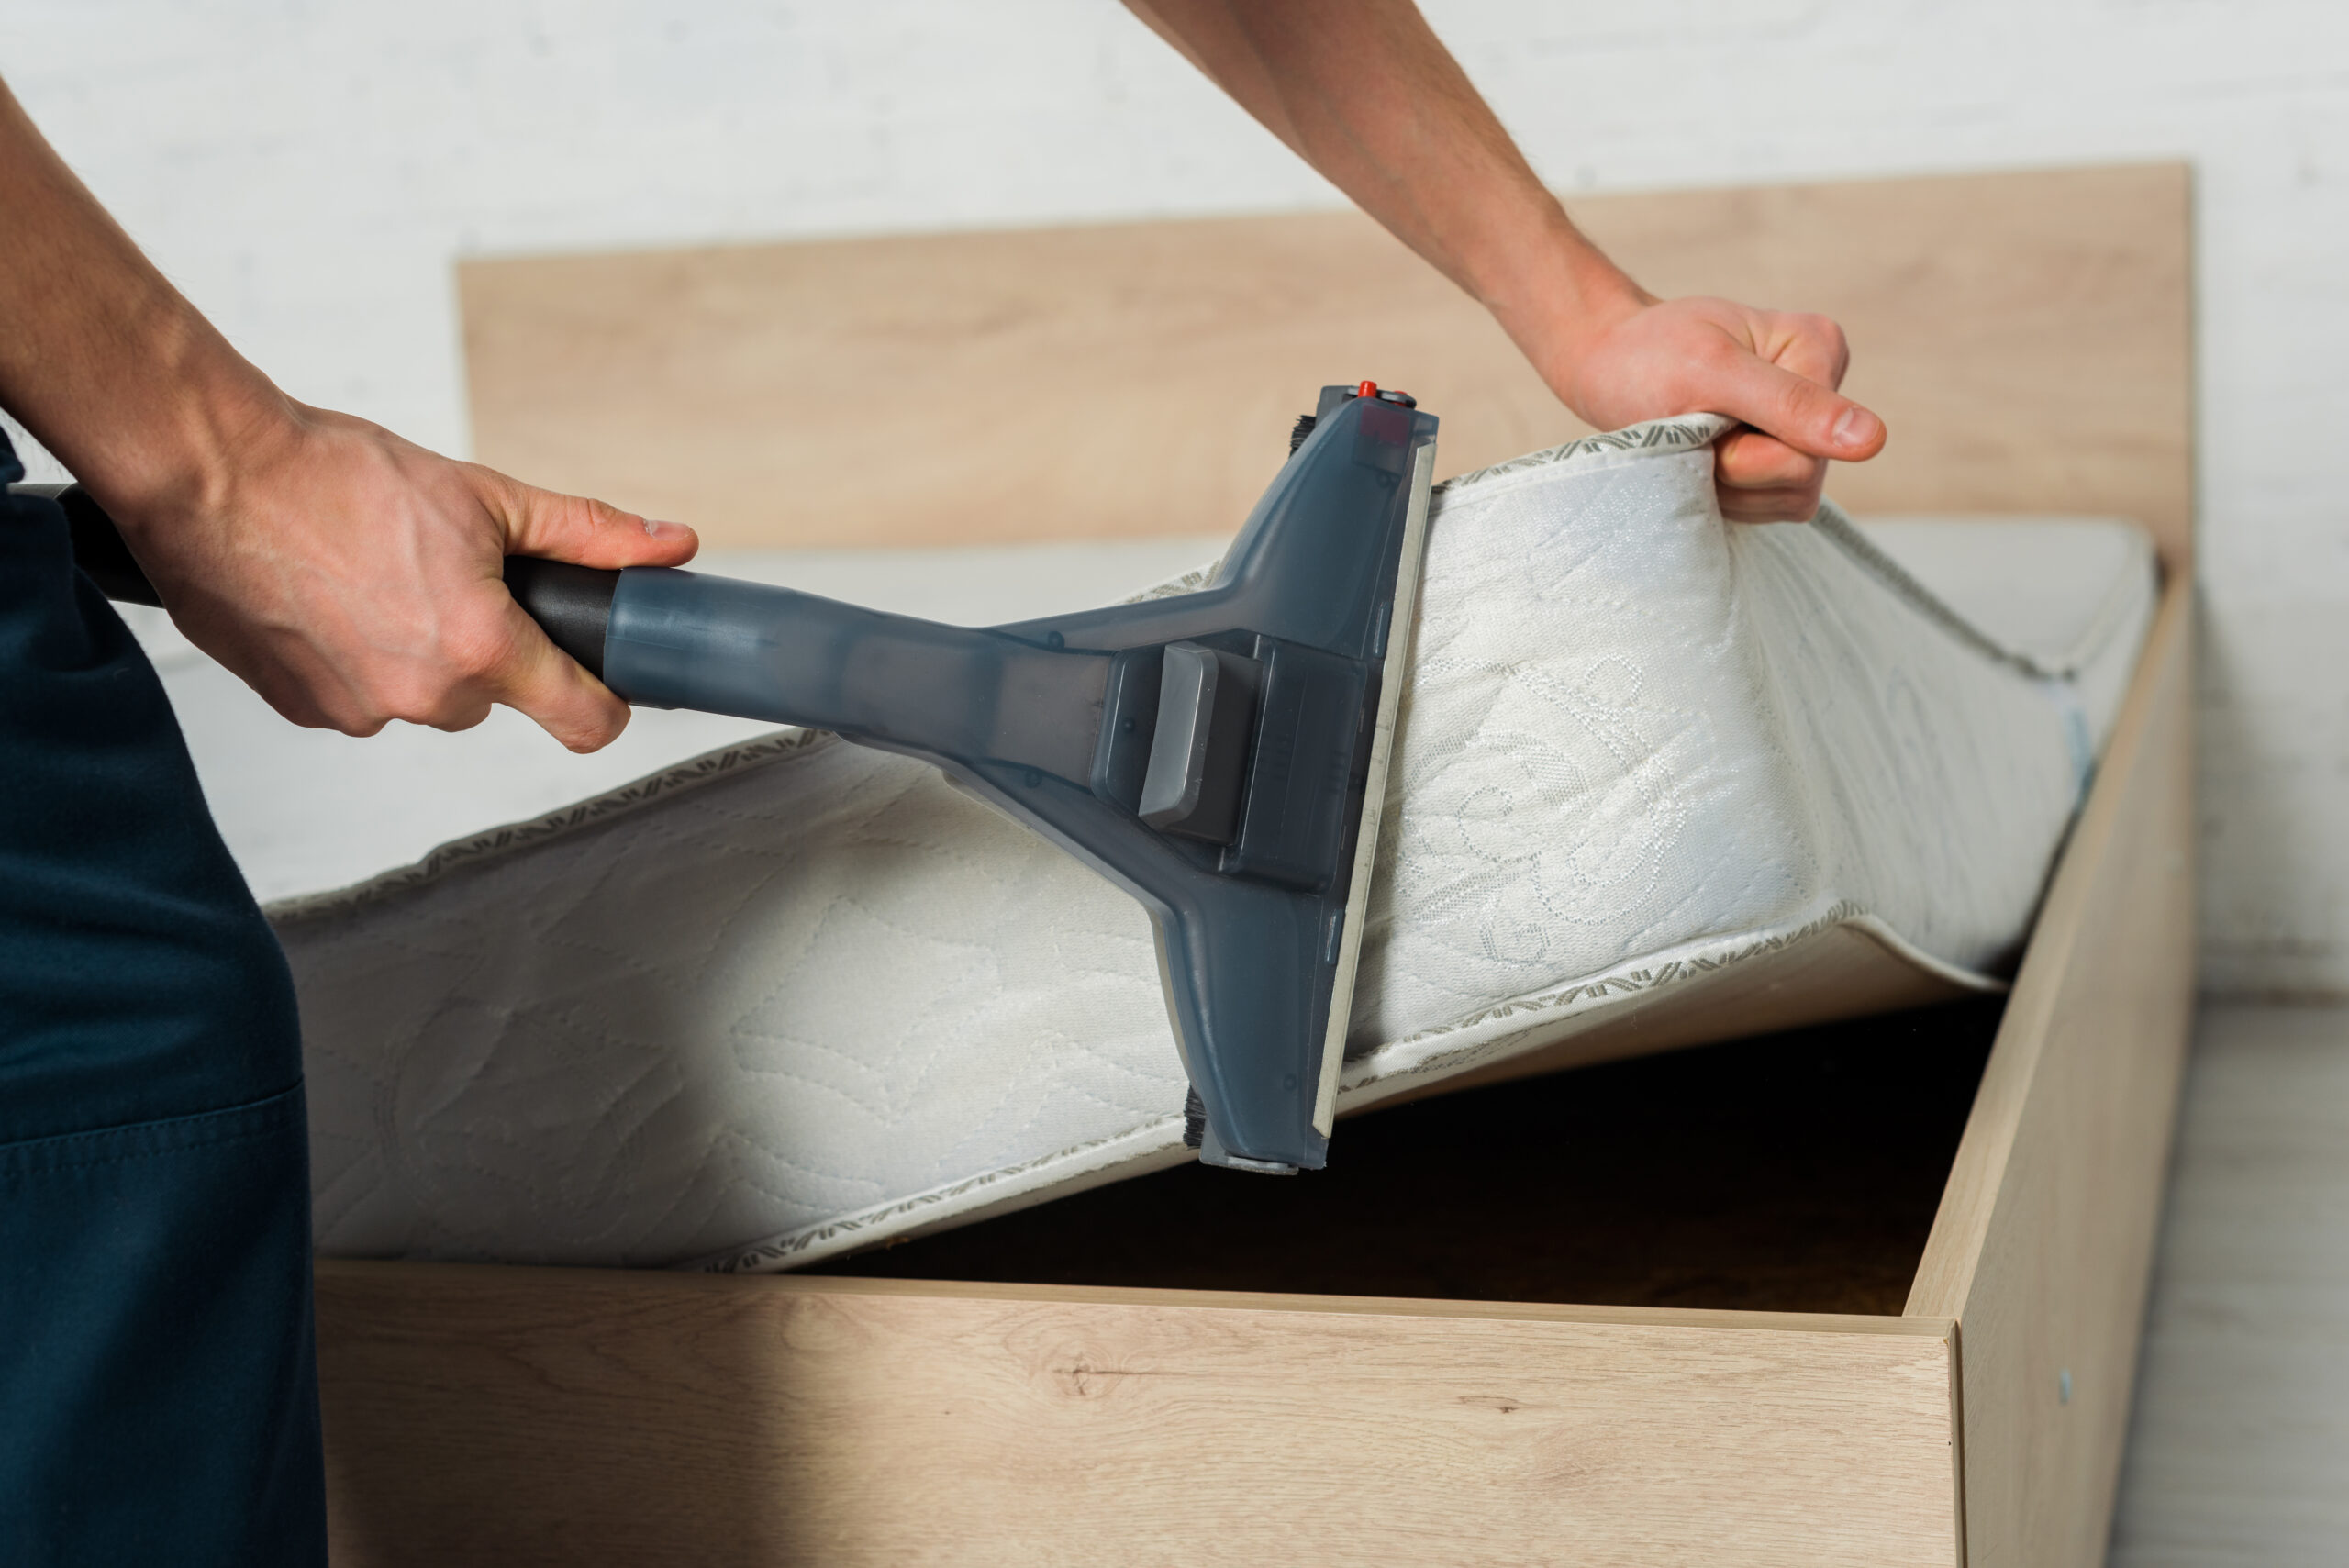 How To Fix Mattress Indentation - Vacuum It